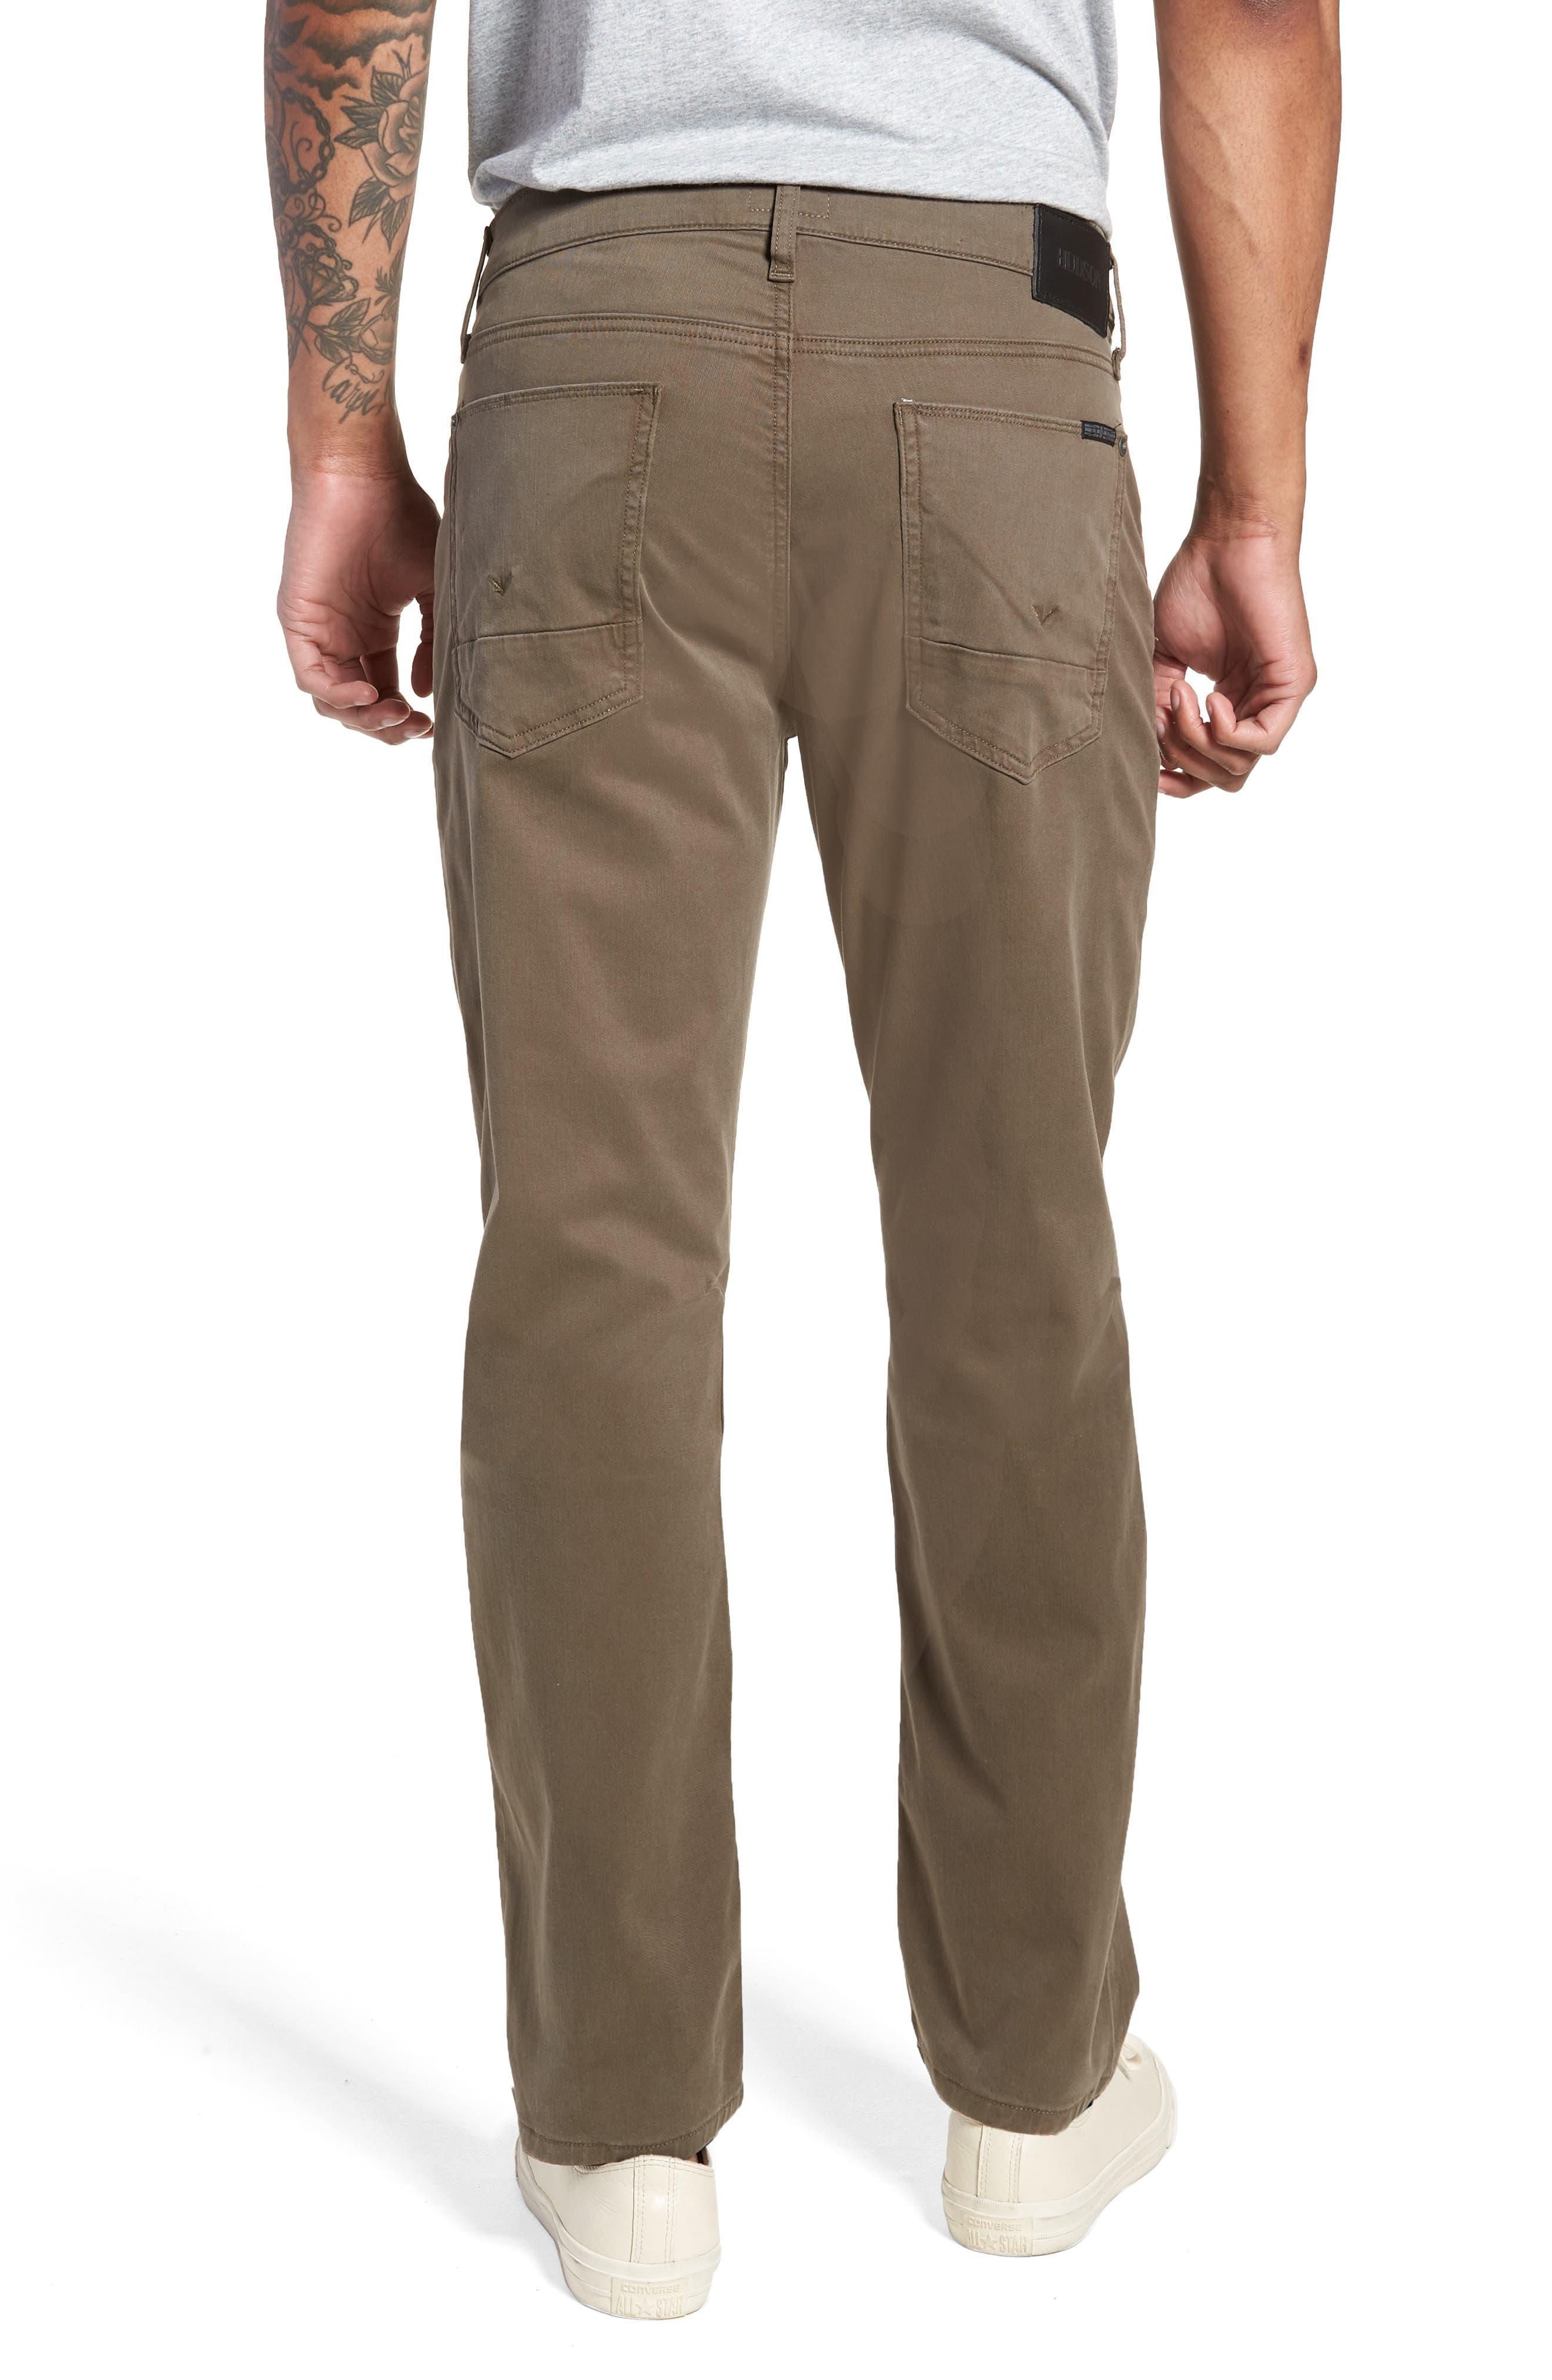 Blake Slim Fit Jeans,                             Alternate thumbnail 2, color,                             PLASTER